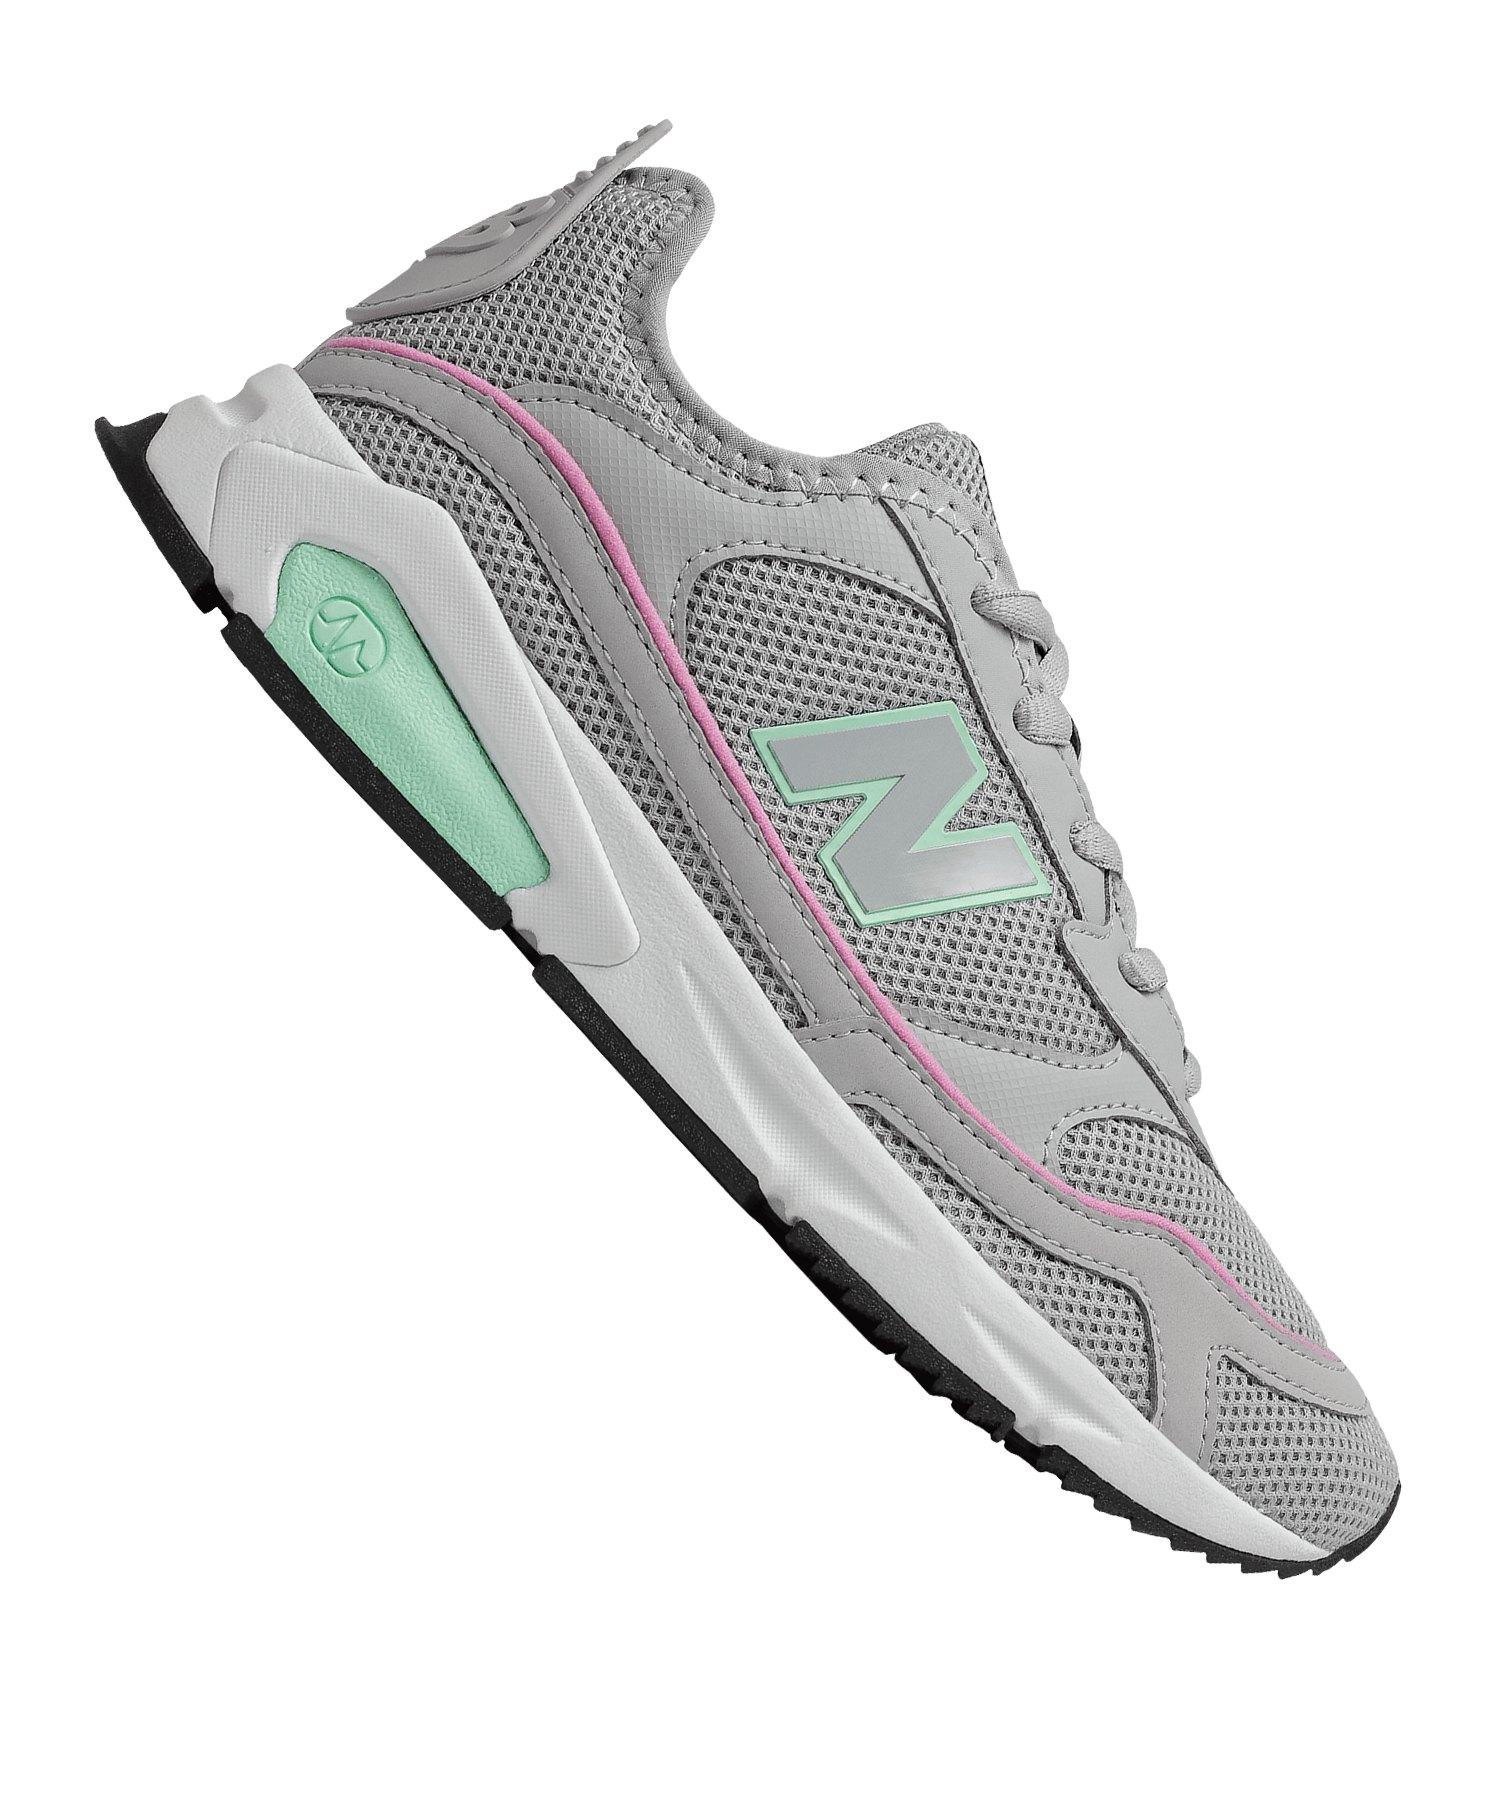 New Balance WSXRC B Sneaker Damen Grau F12 - grau